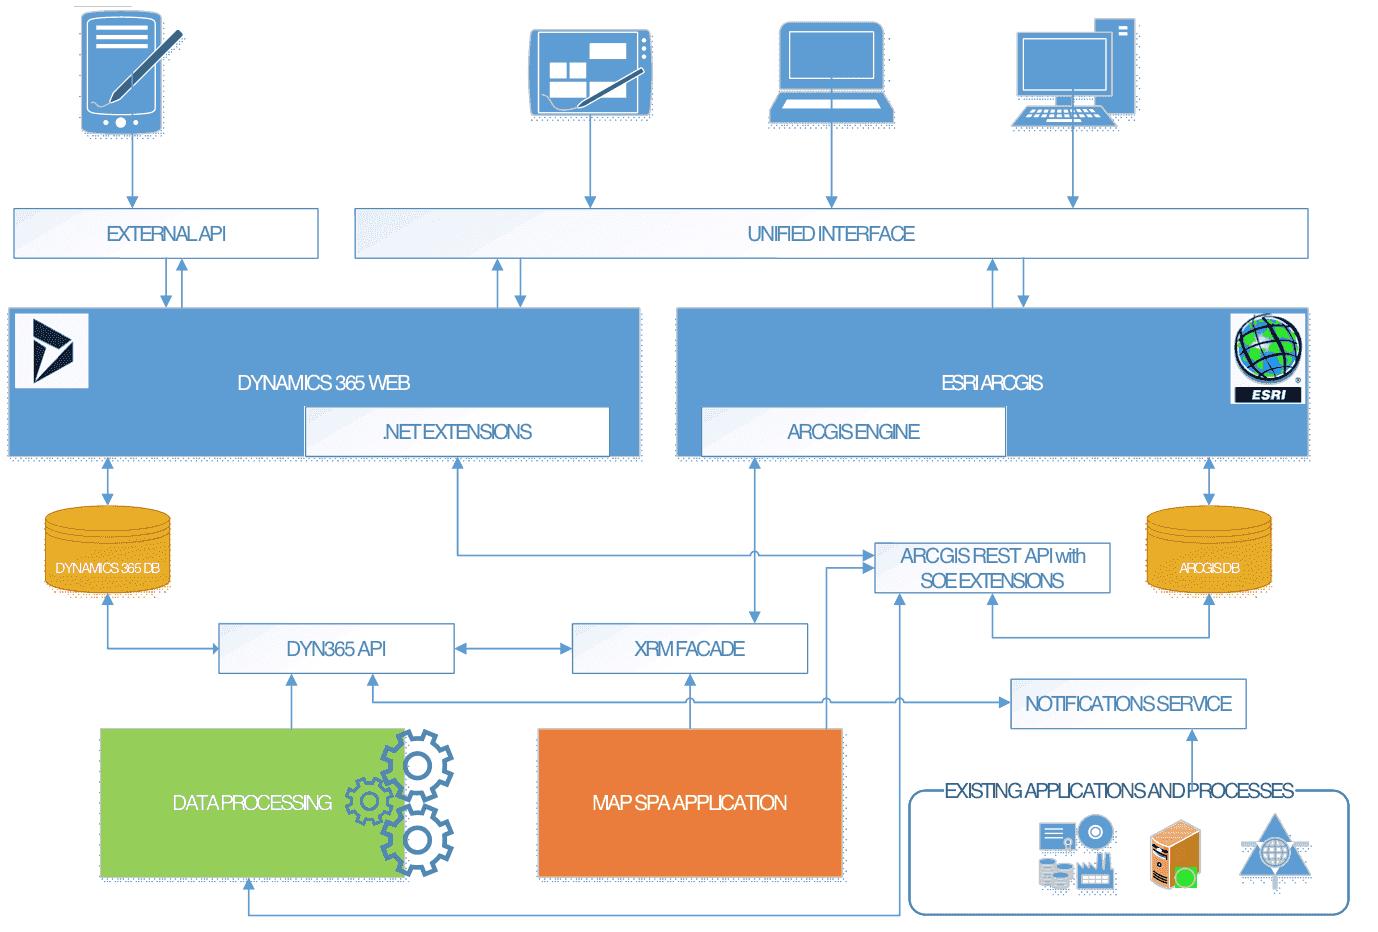 Dynamics 365 Data Model Diagram - Quantum Computing within Er Diagram Dynamics 365